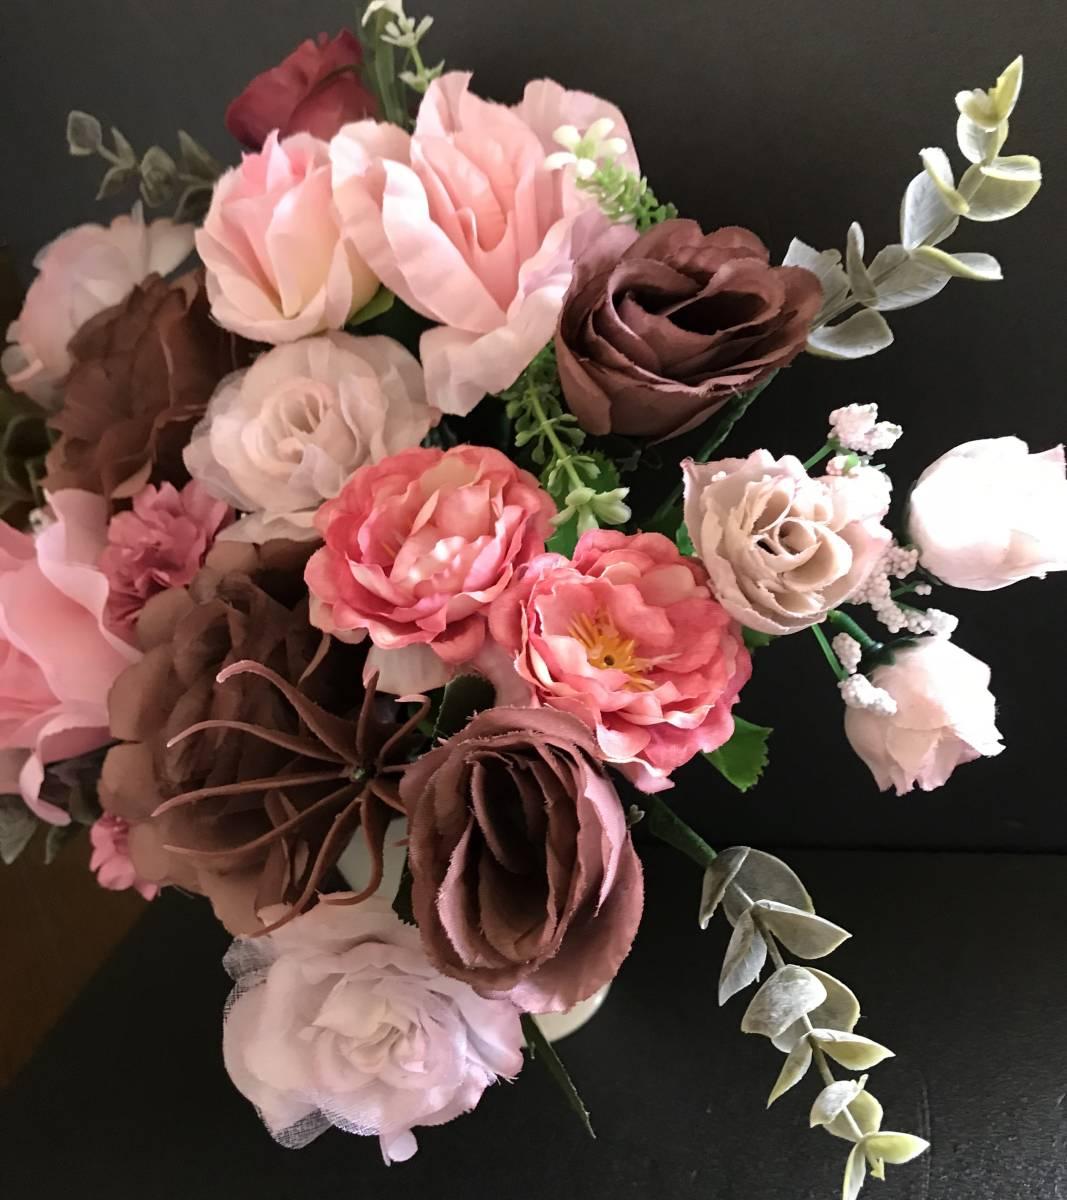 pretty flower����SALE�I�x�[�W���Ԋ�`���R���[�g�u���E���ƃ~���N�e�B�[�s���N���K�N�t�F�~�j���A�����W Image5